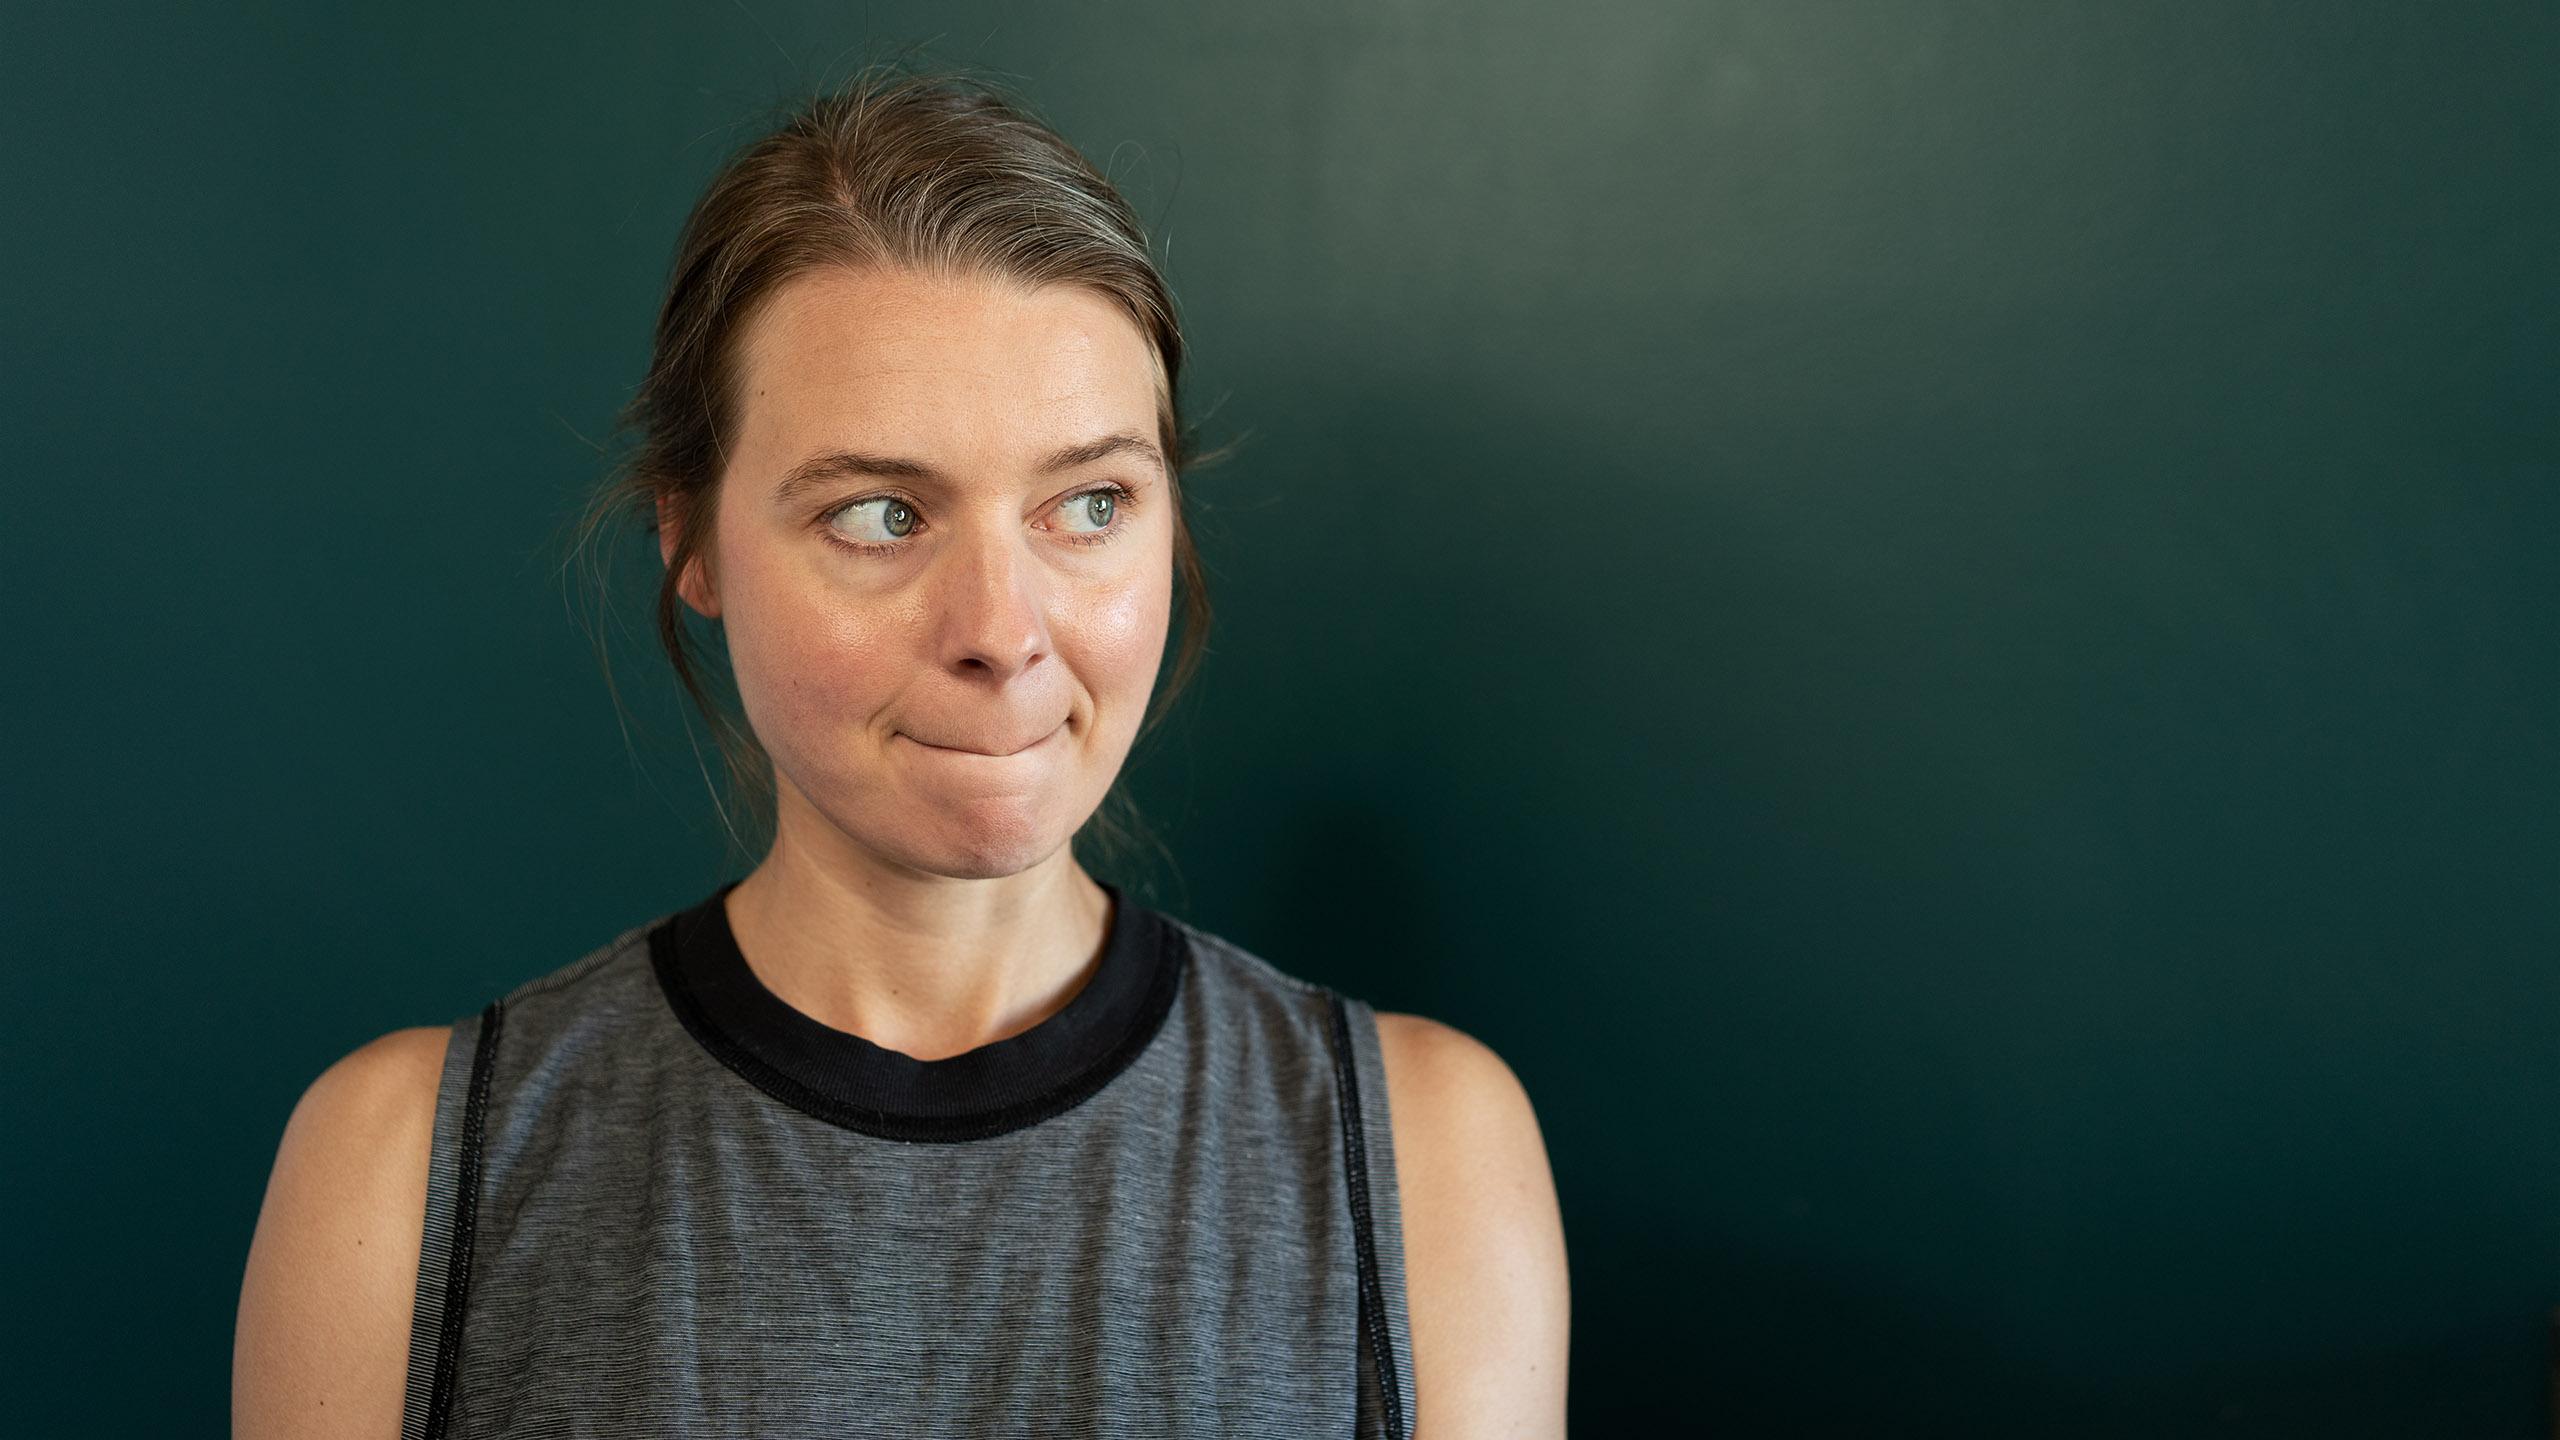 Female photographer mistake portrait